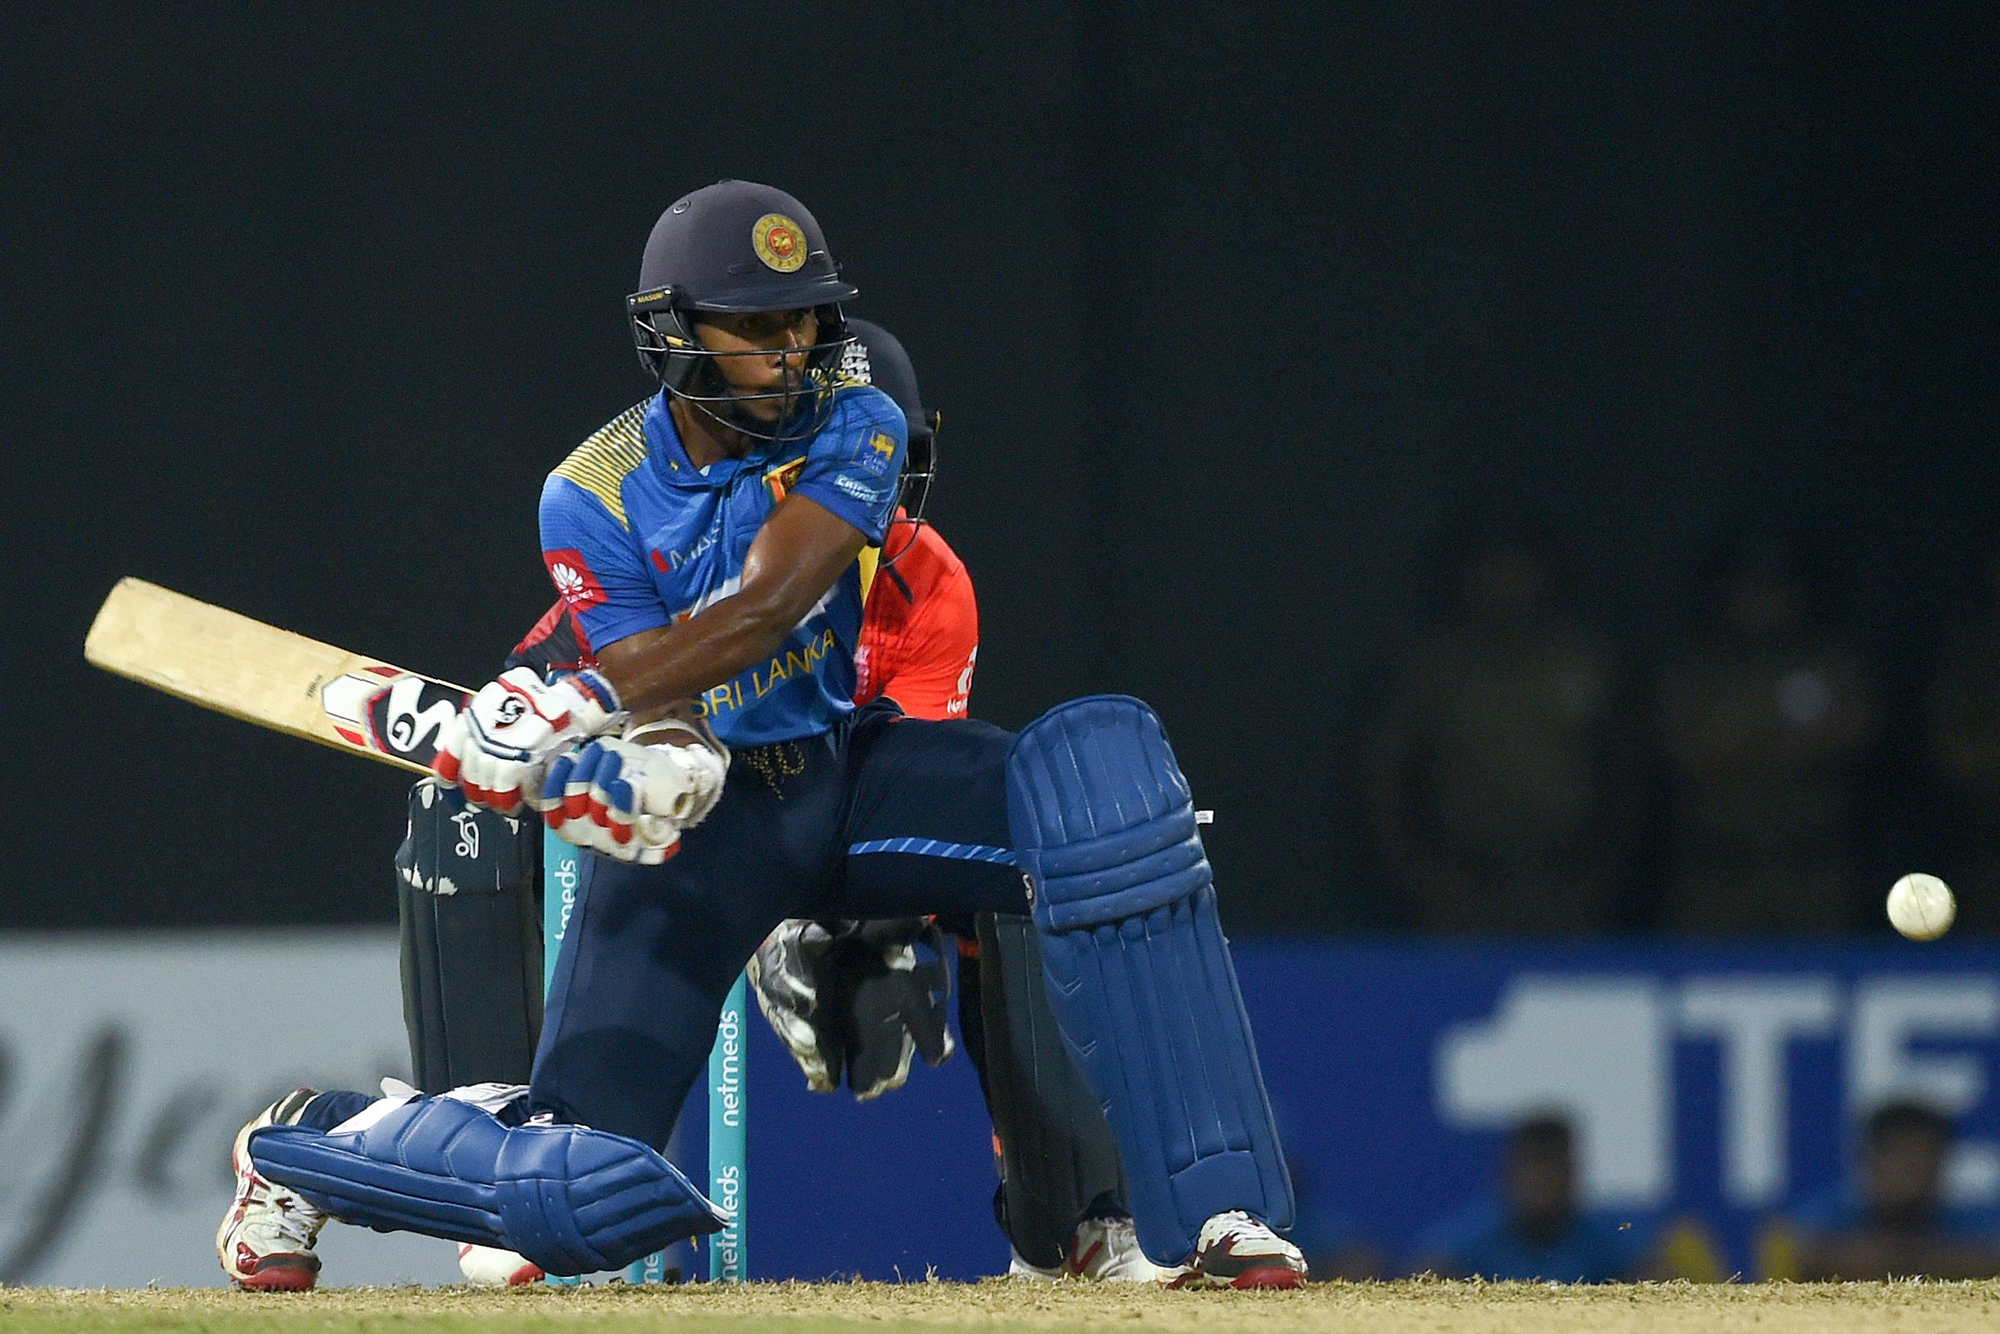 Sri Lankan cricketer Kamindu Mendis plays a shot during the International Twenty20 cricket match between Sri Lanka and England at the R Peremadasa Stadium in Colombo on October 27, 2018. (Photo by ISHARA S. KODIKARA / AFP)